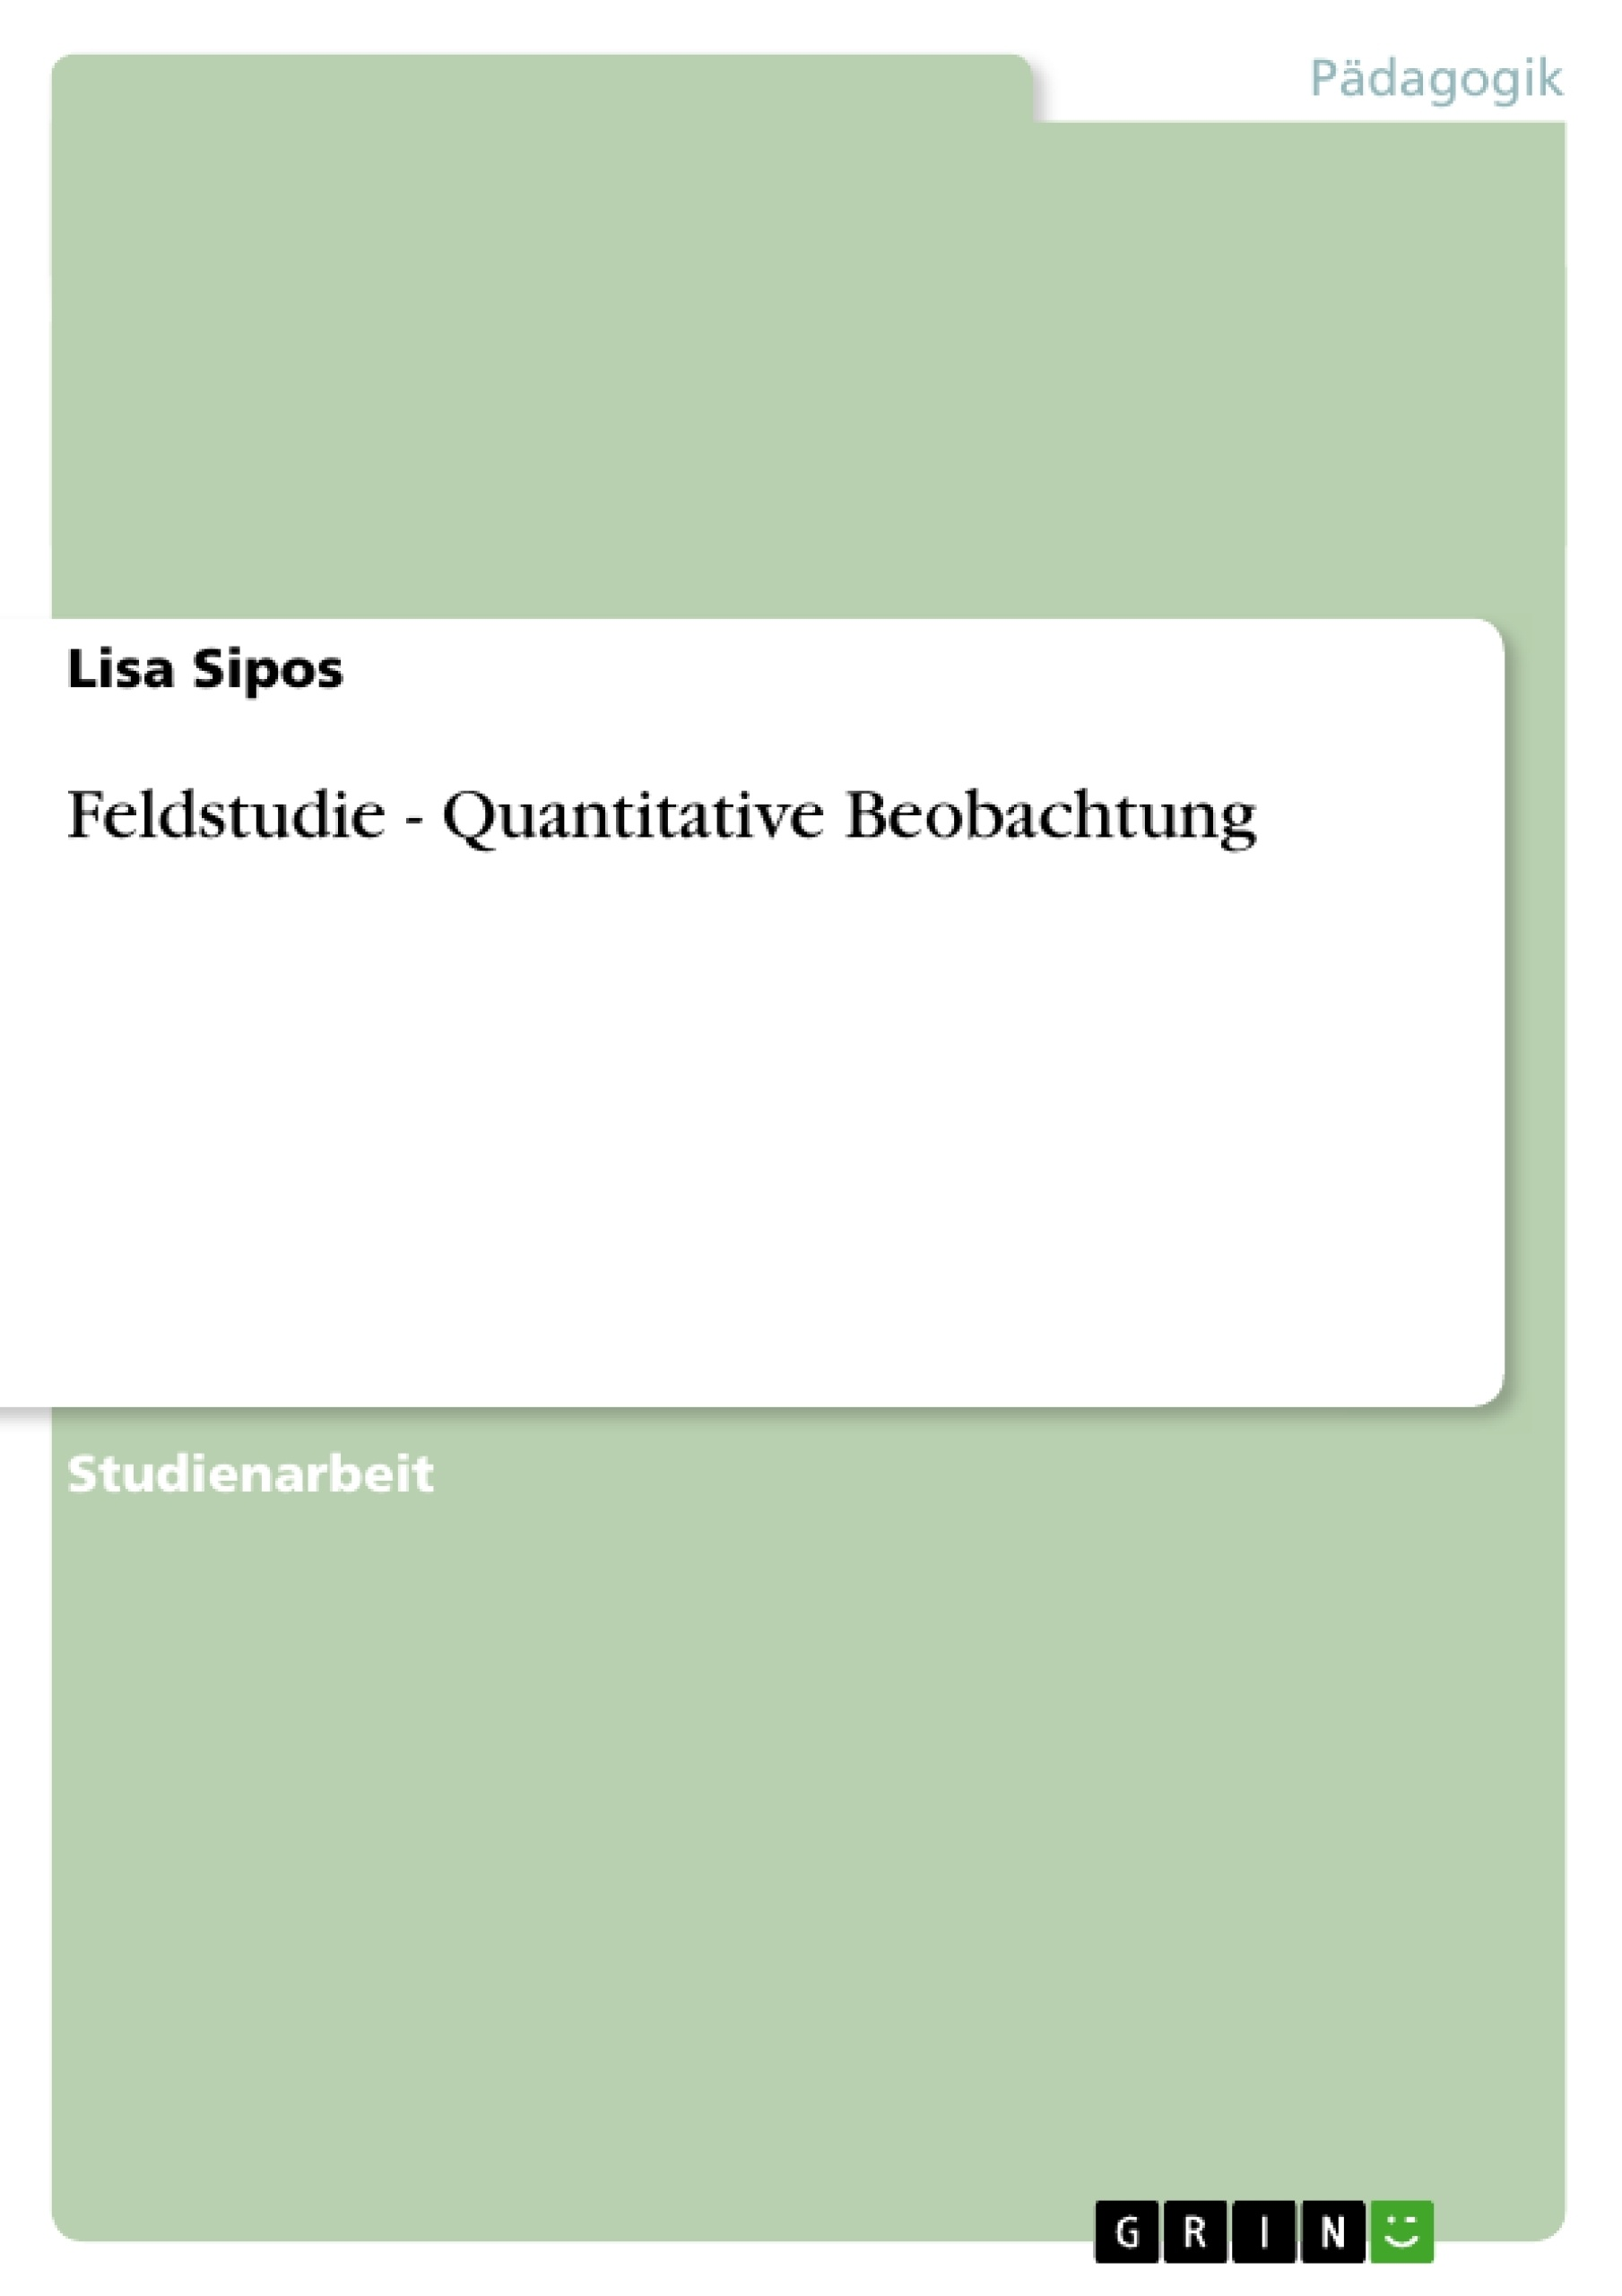 Titel: Feldstudie - Quantitative Beobachtung